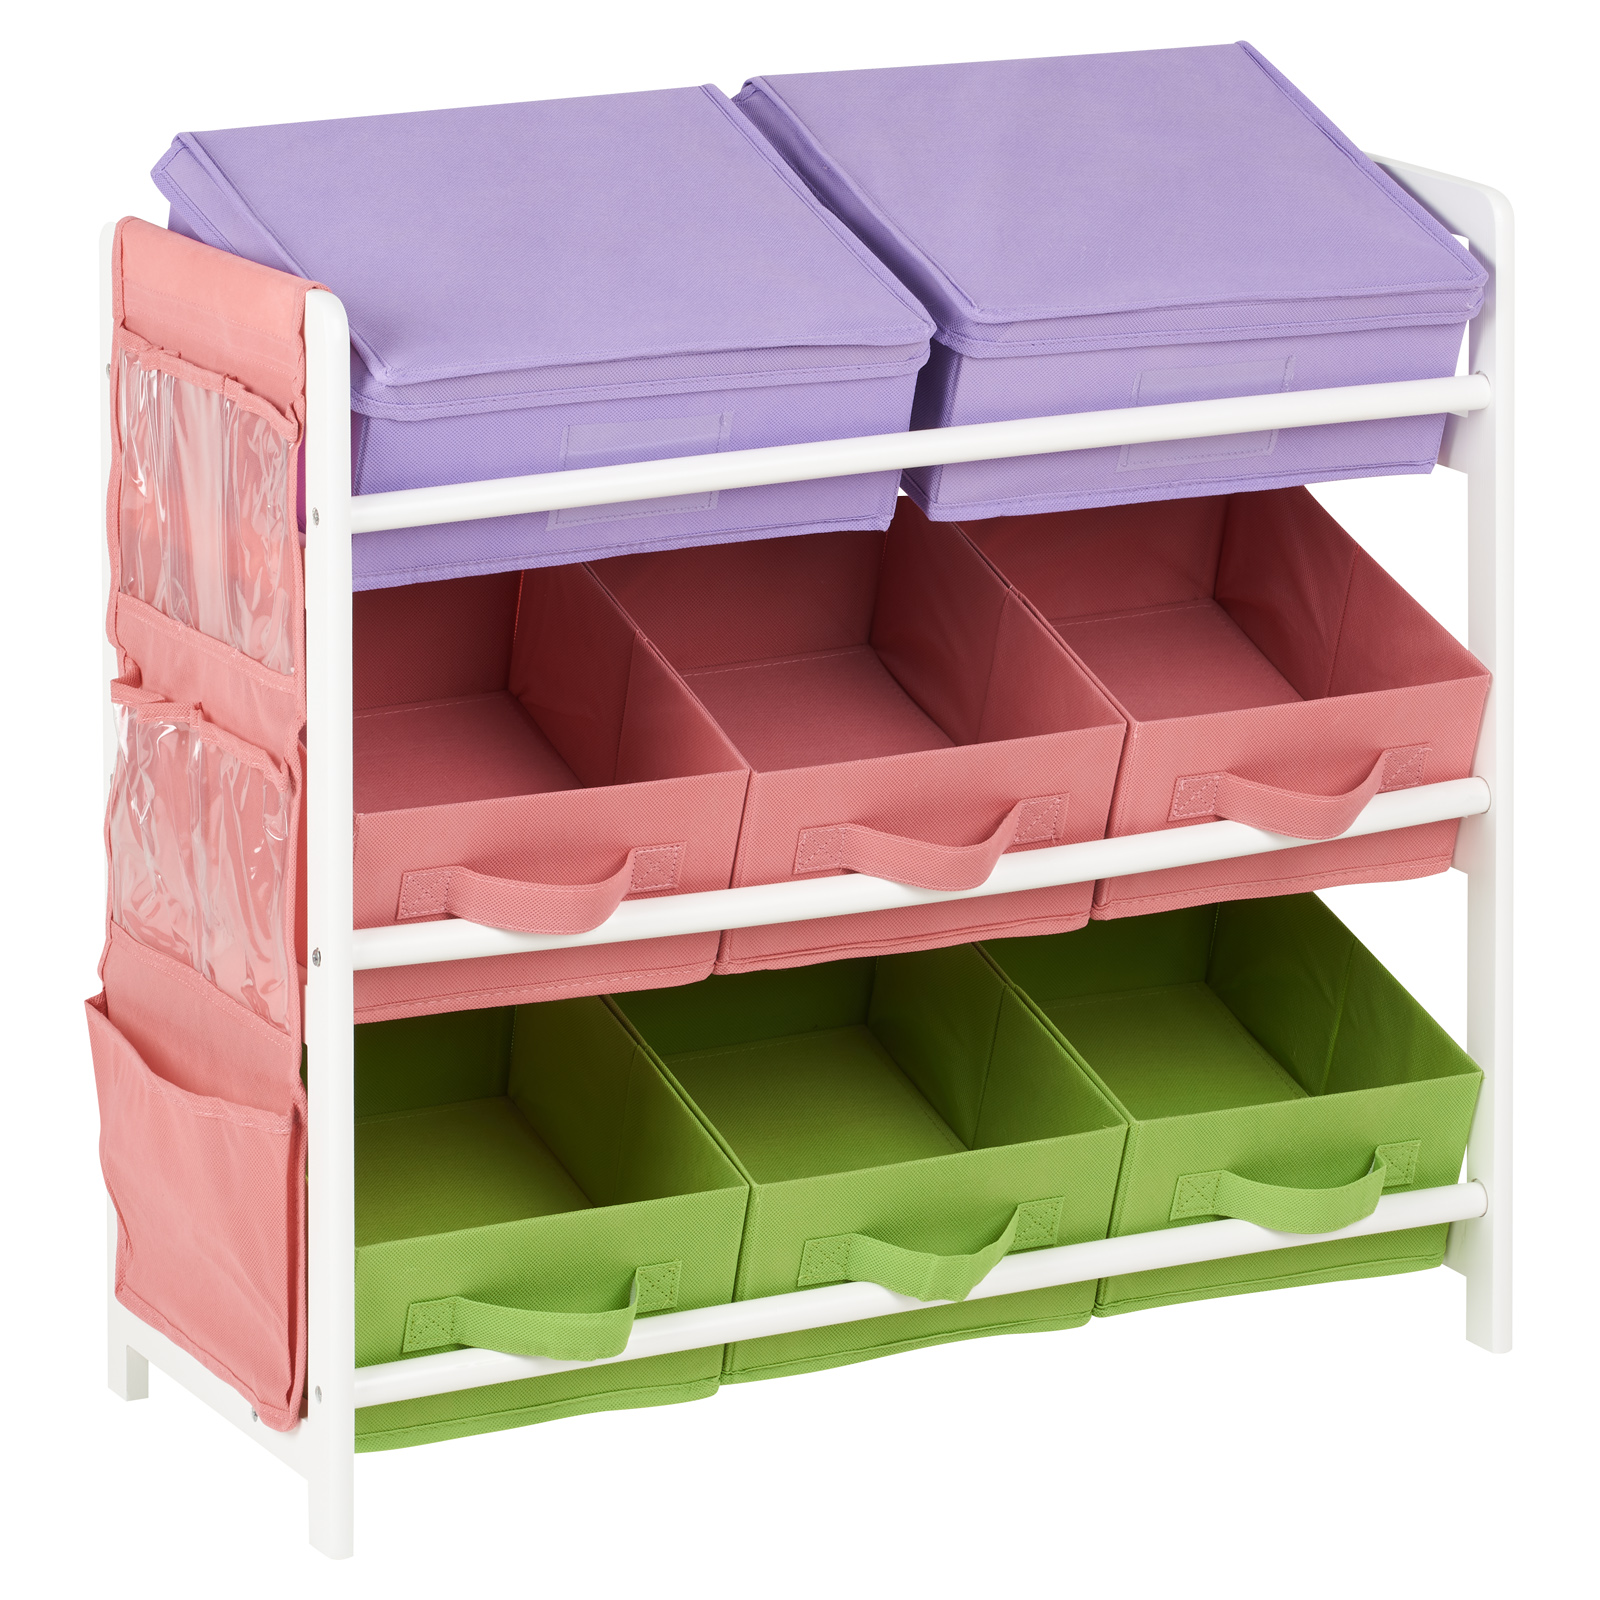 Details about Hartleys Childrens Bedroom Fun Shelf Drawers Kids Toy/Book  Storage Box Furniture